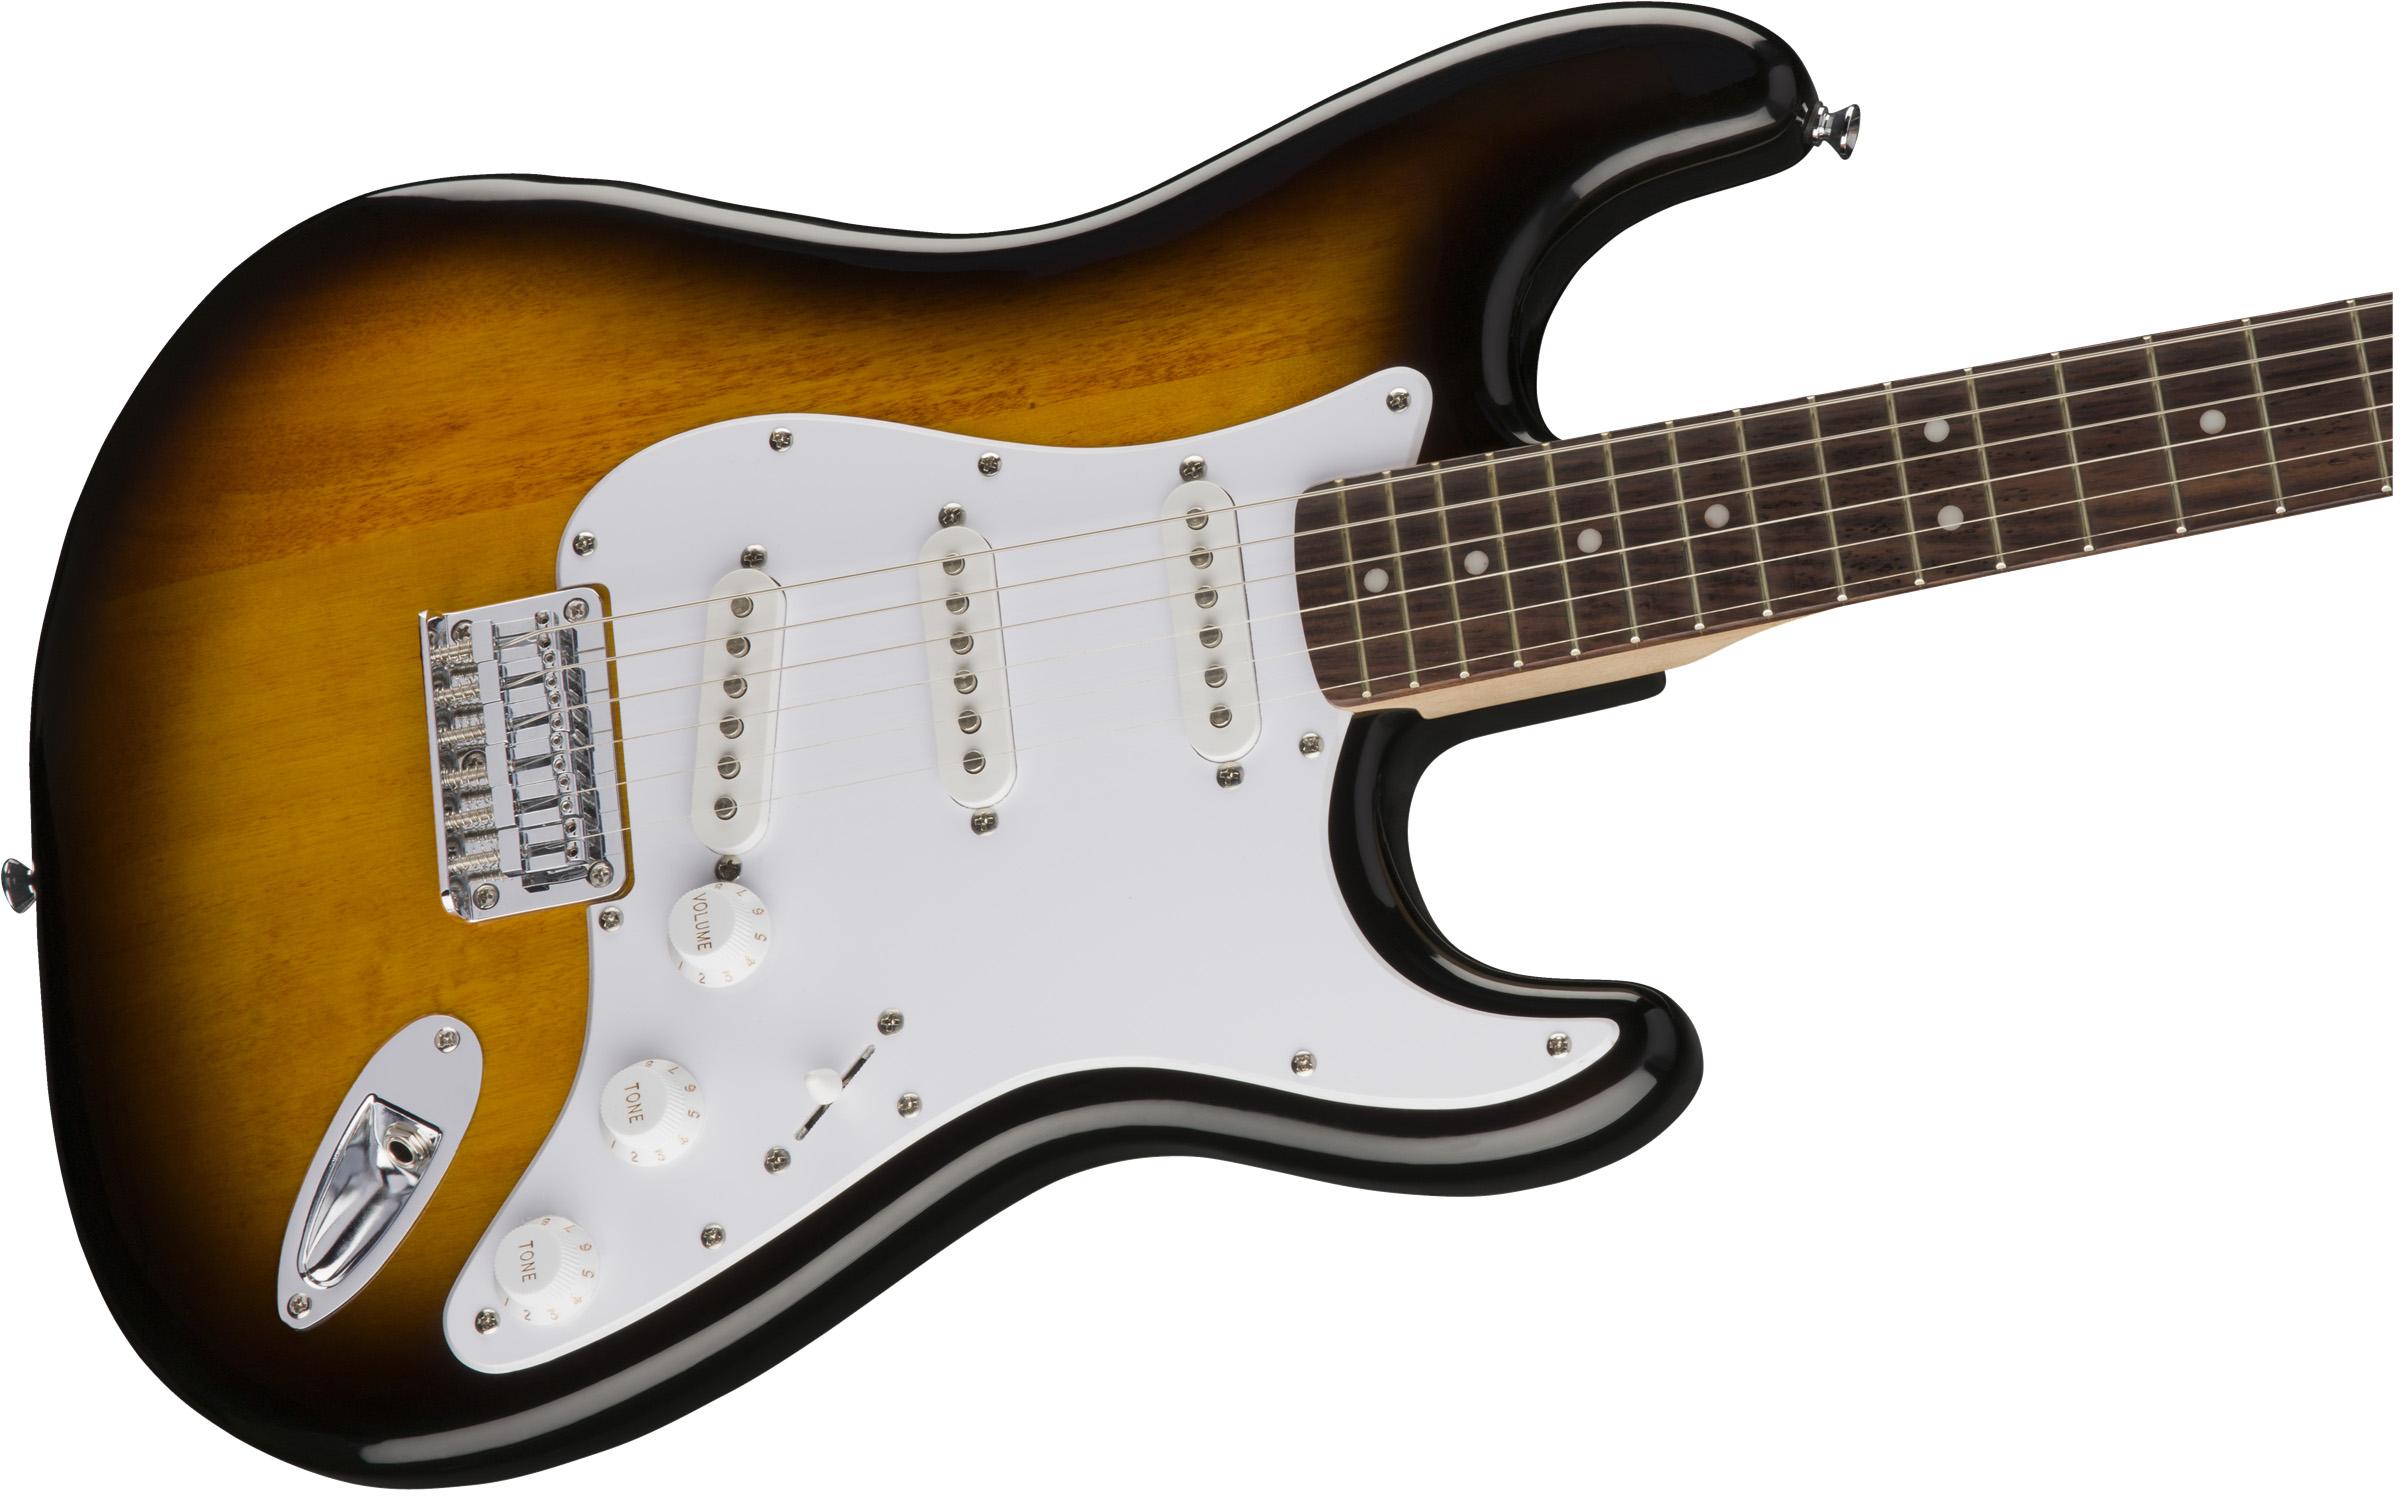 thumbnail 5 - Fender Squier Bullet Stratocaster HT - Sunburst w/ Frontman 10G Amplifier